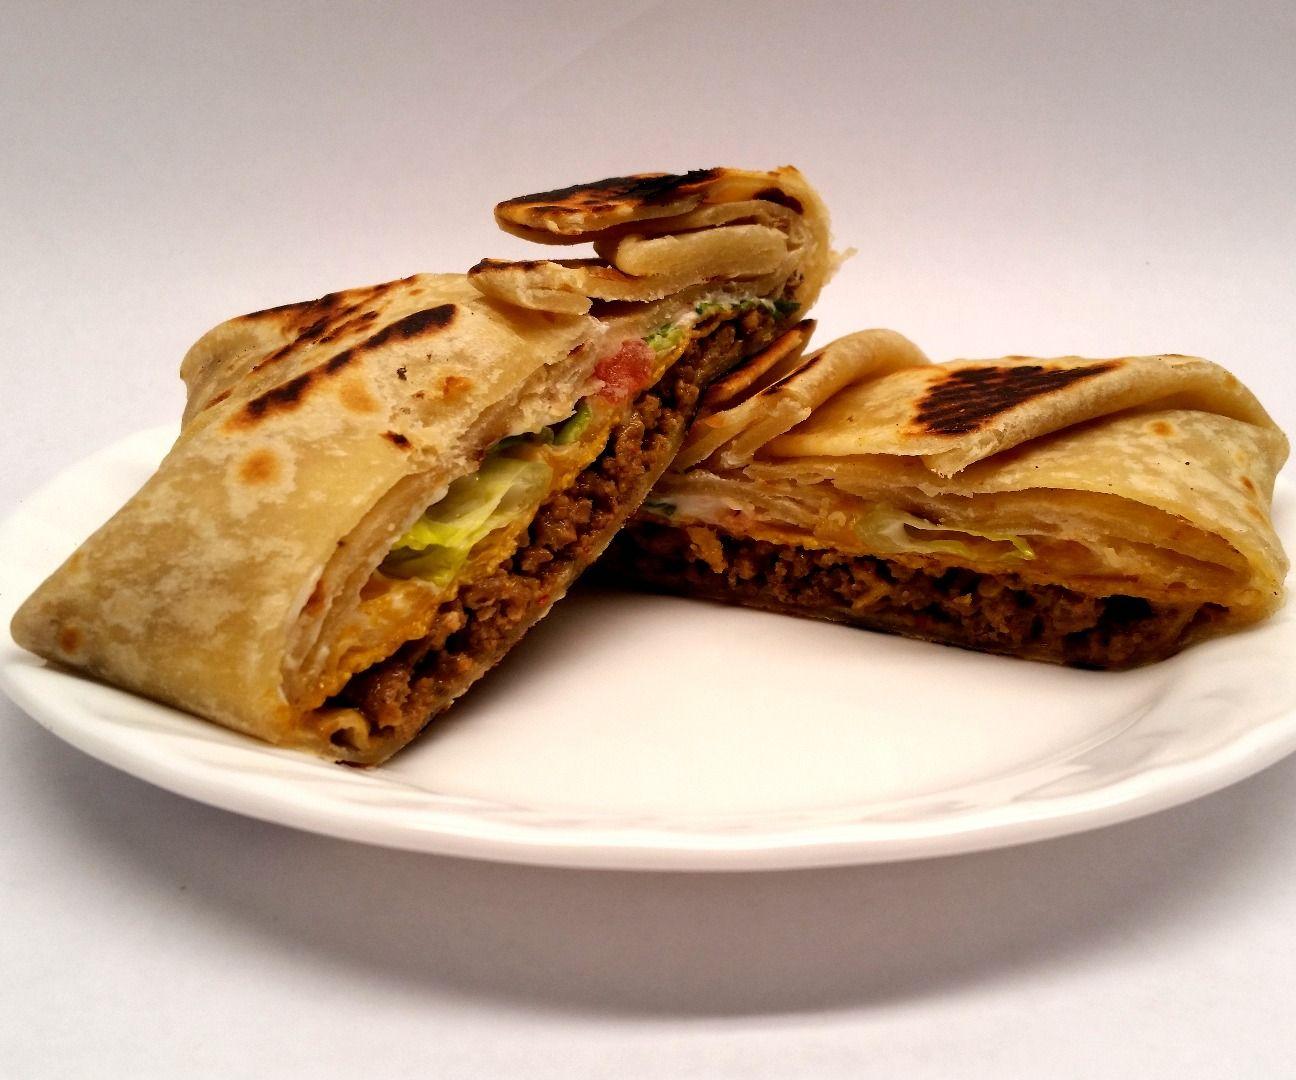 Taco Bell Crunchwrap Supreme - Copycat Recipe